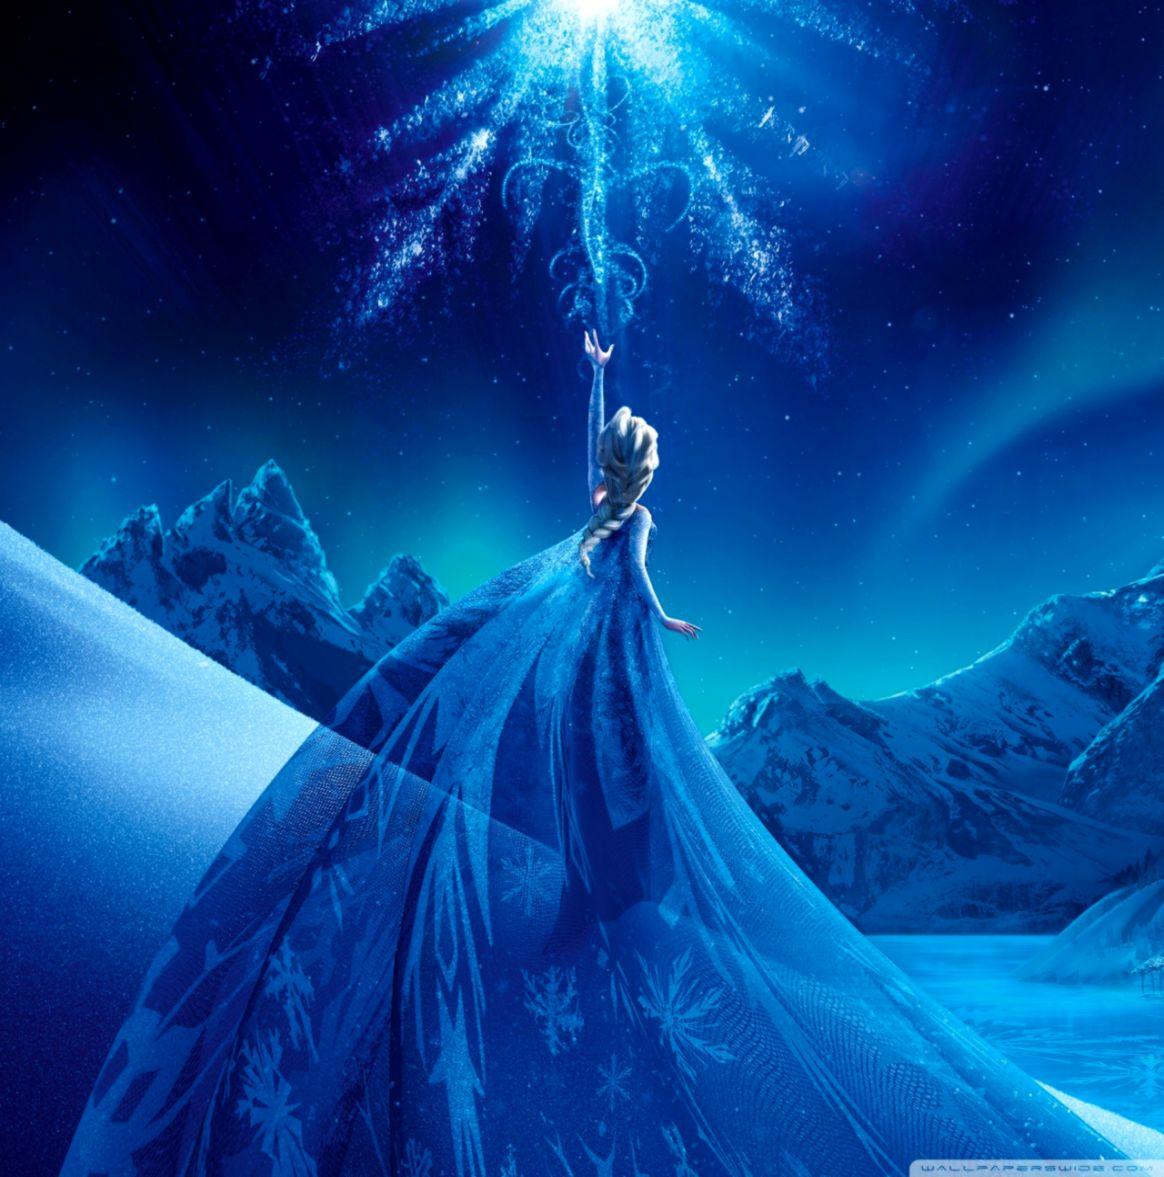 Elsa Frozen 4k Hd Desktop Wallpaper For 4k Ultra Hd Wallpapers For Samsung J5 1164x1177 Wallpaper Teahub Io